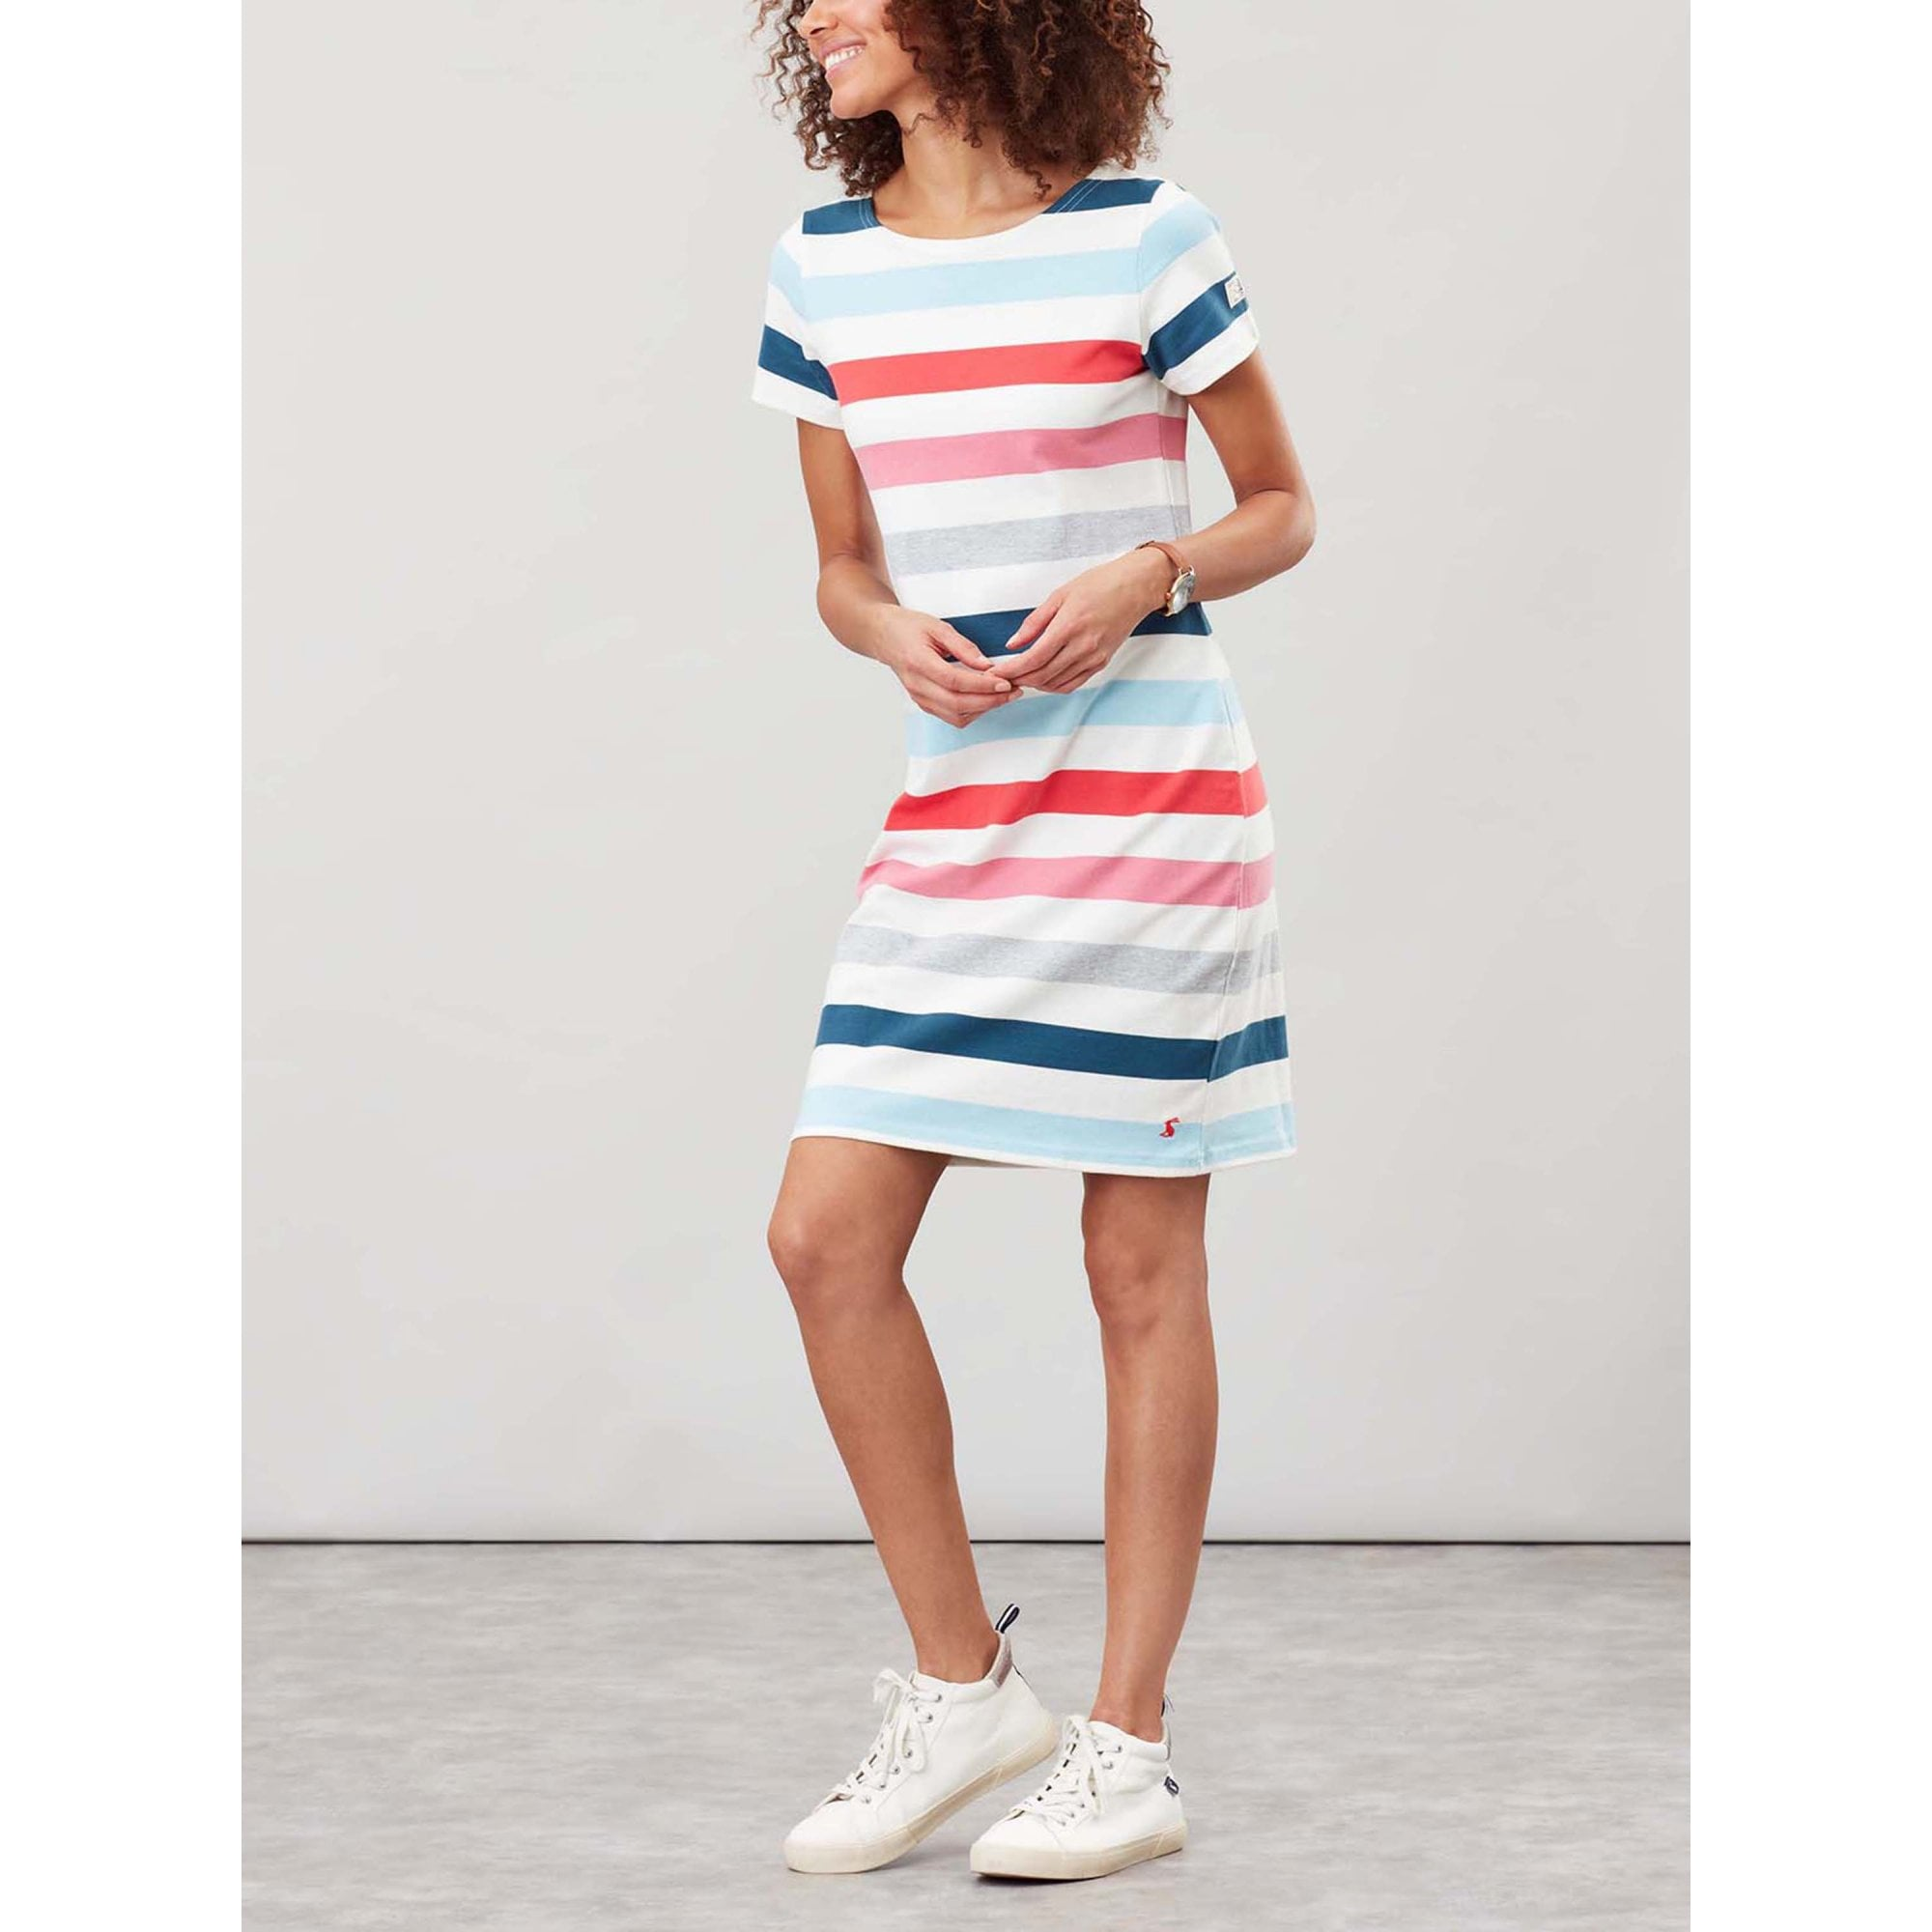 Joules_dames_jurken_Riviera_Printed_dress_1